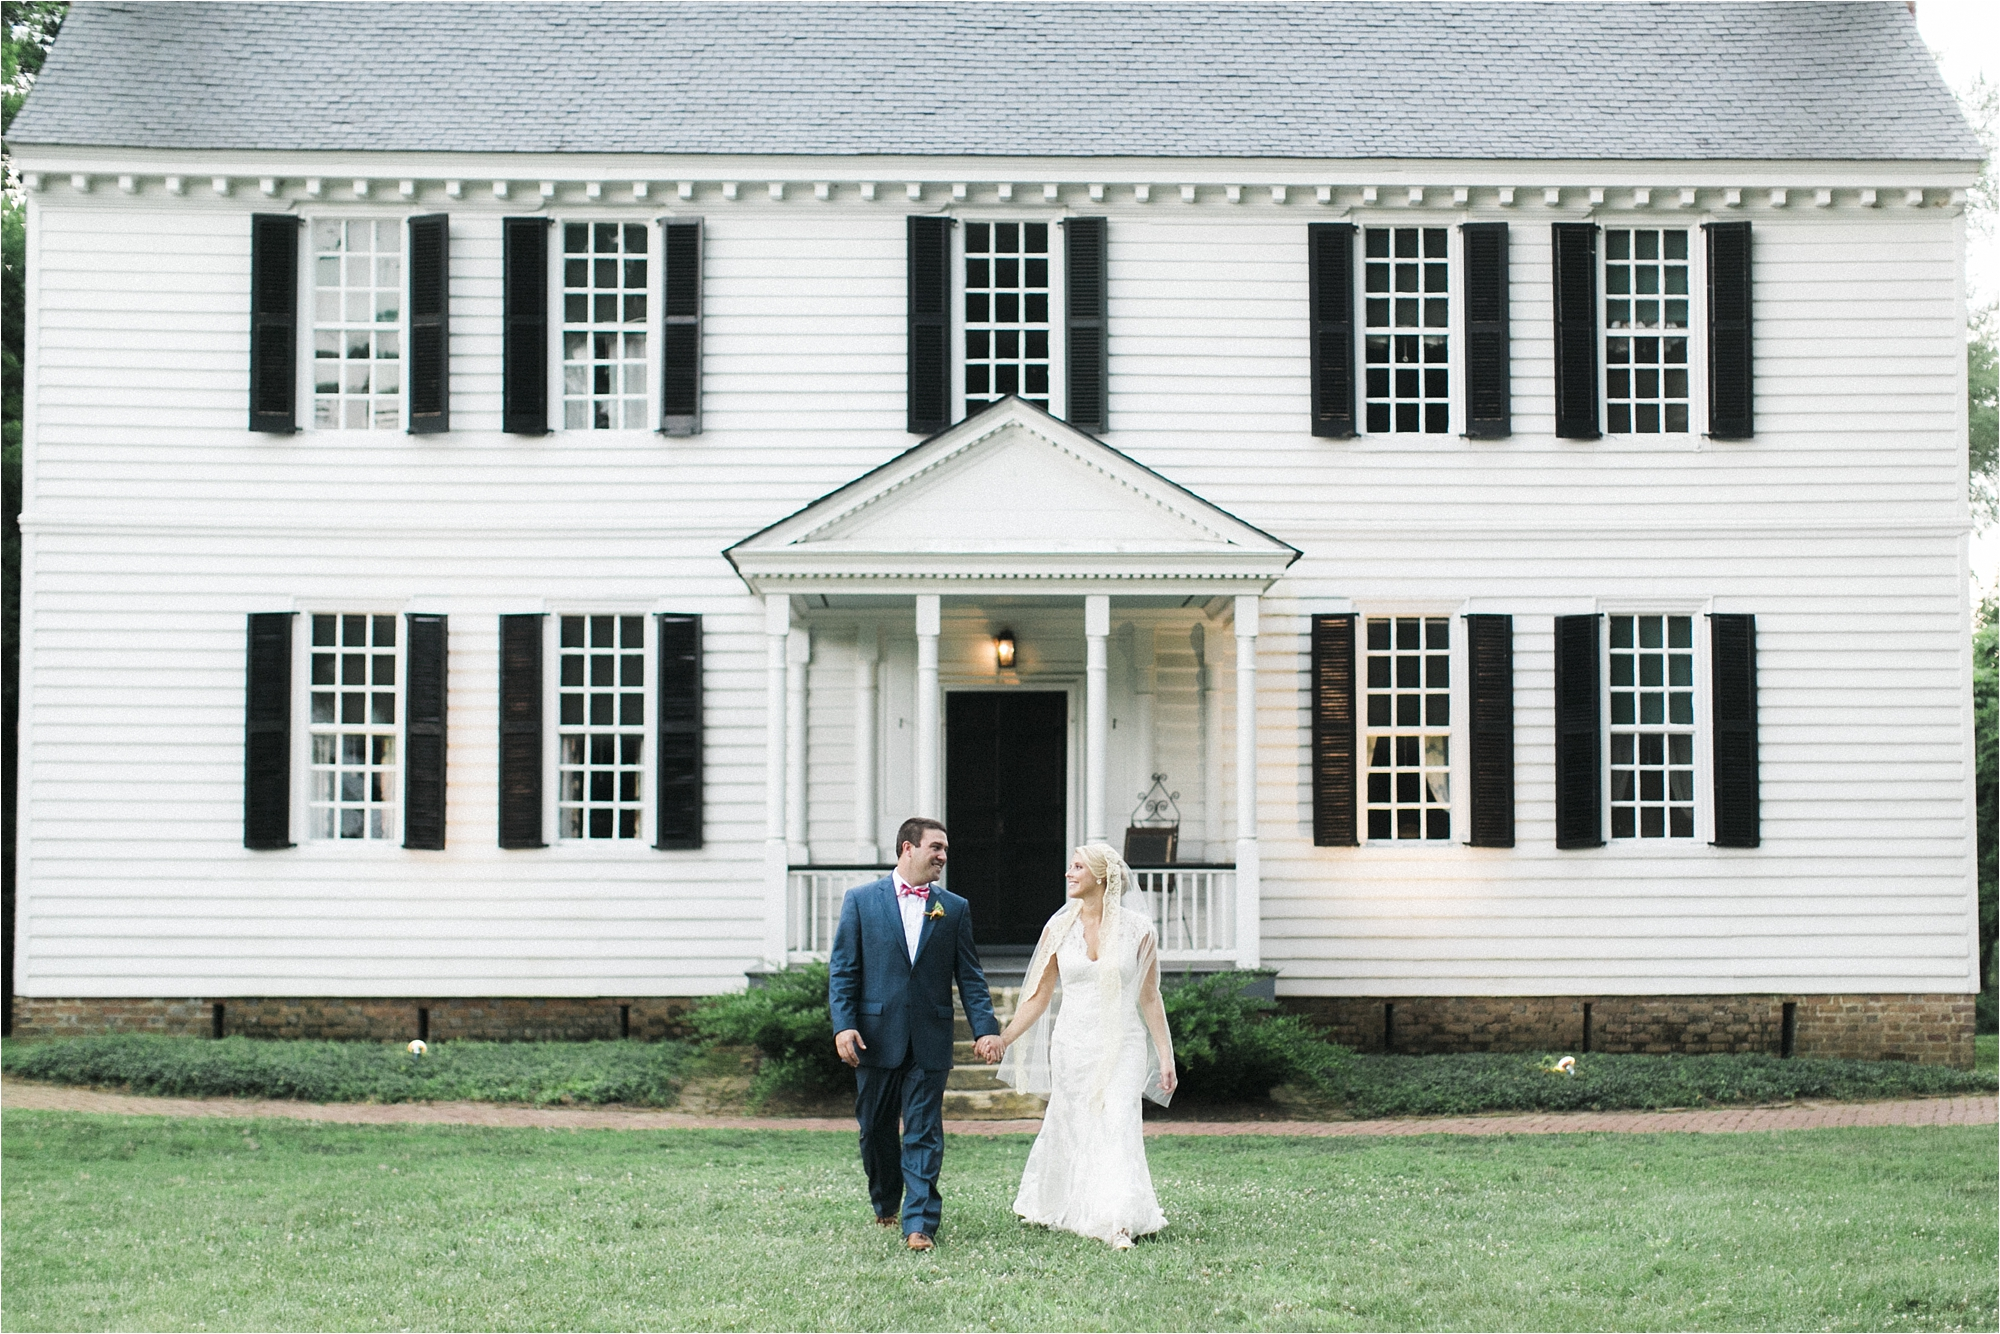 richmond-virginia-tuckahoe-plantation-coral-summer-wedding-stephanie-yonce-photos_0037.jpg